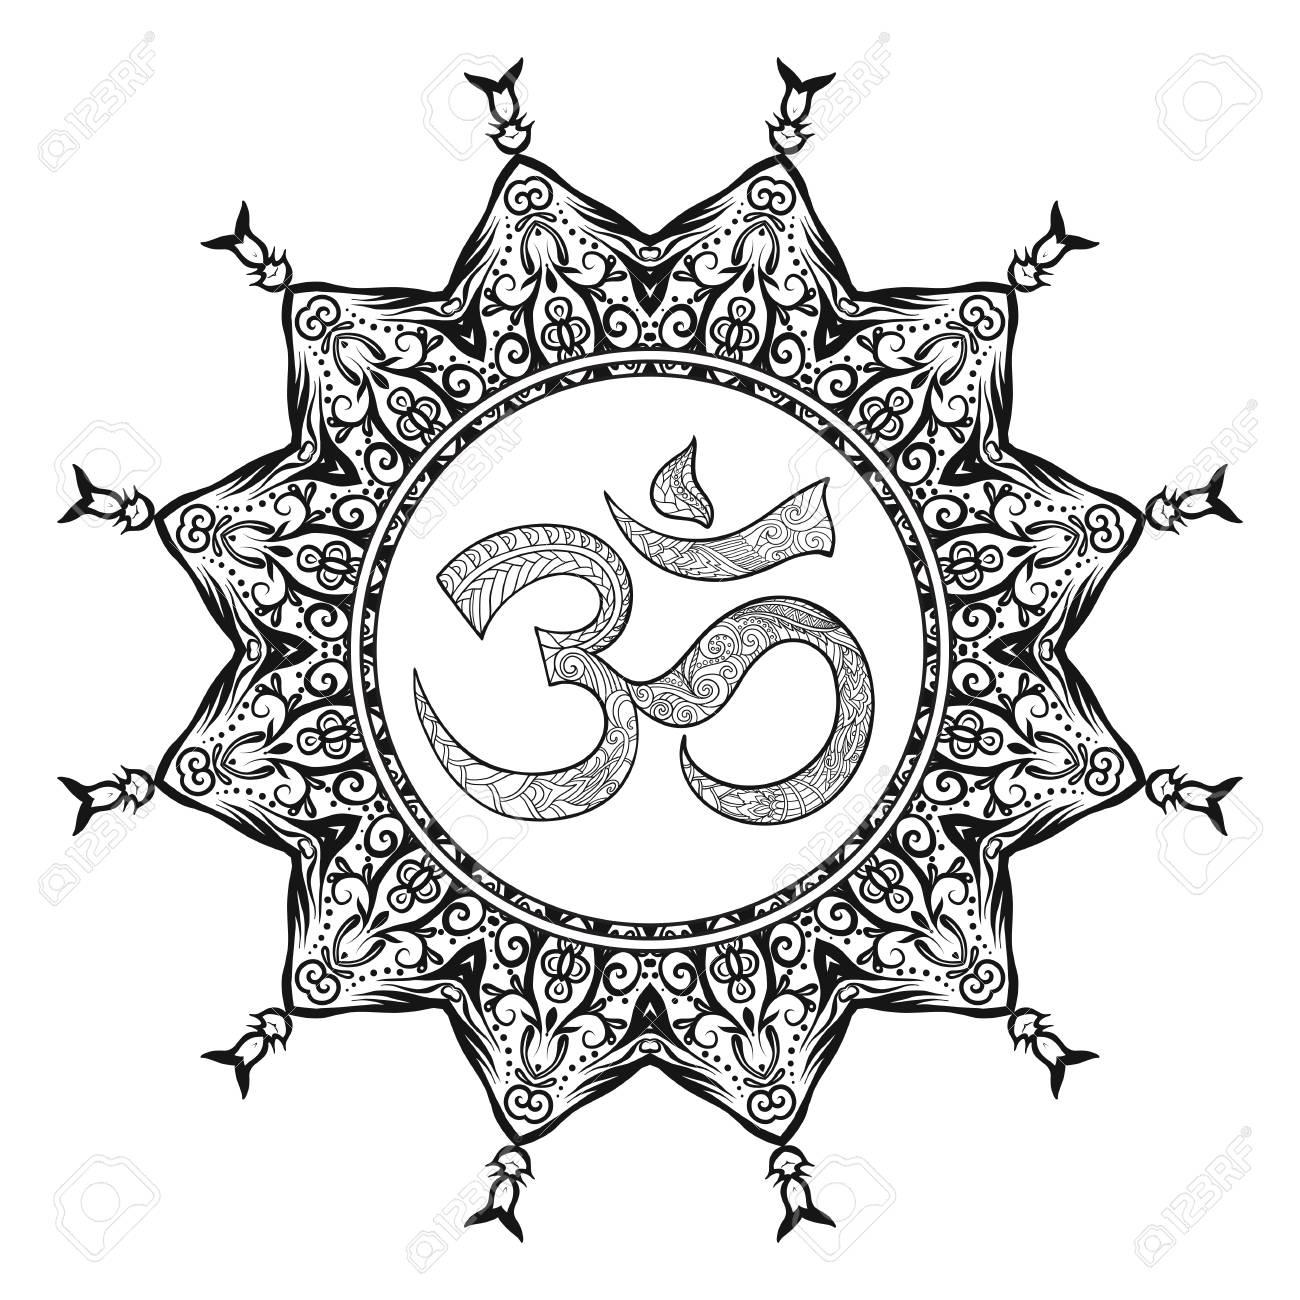 Signo Deco Mandalawith Om Diseño Modelado Del Elemento Amuleto